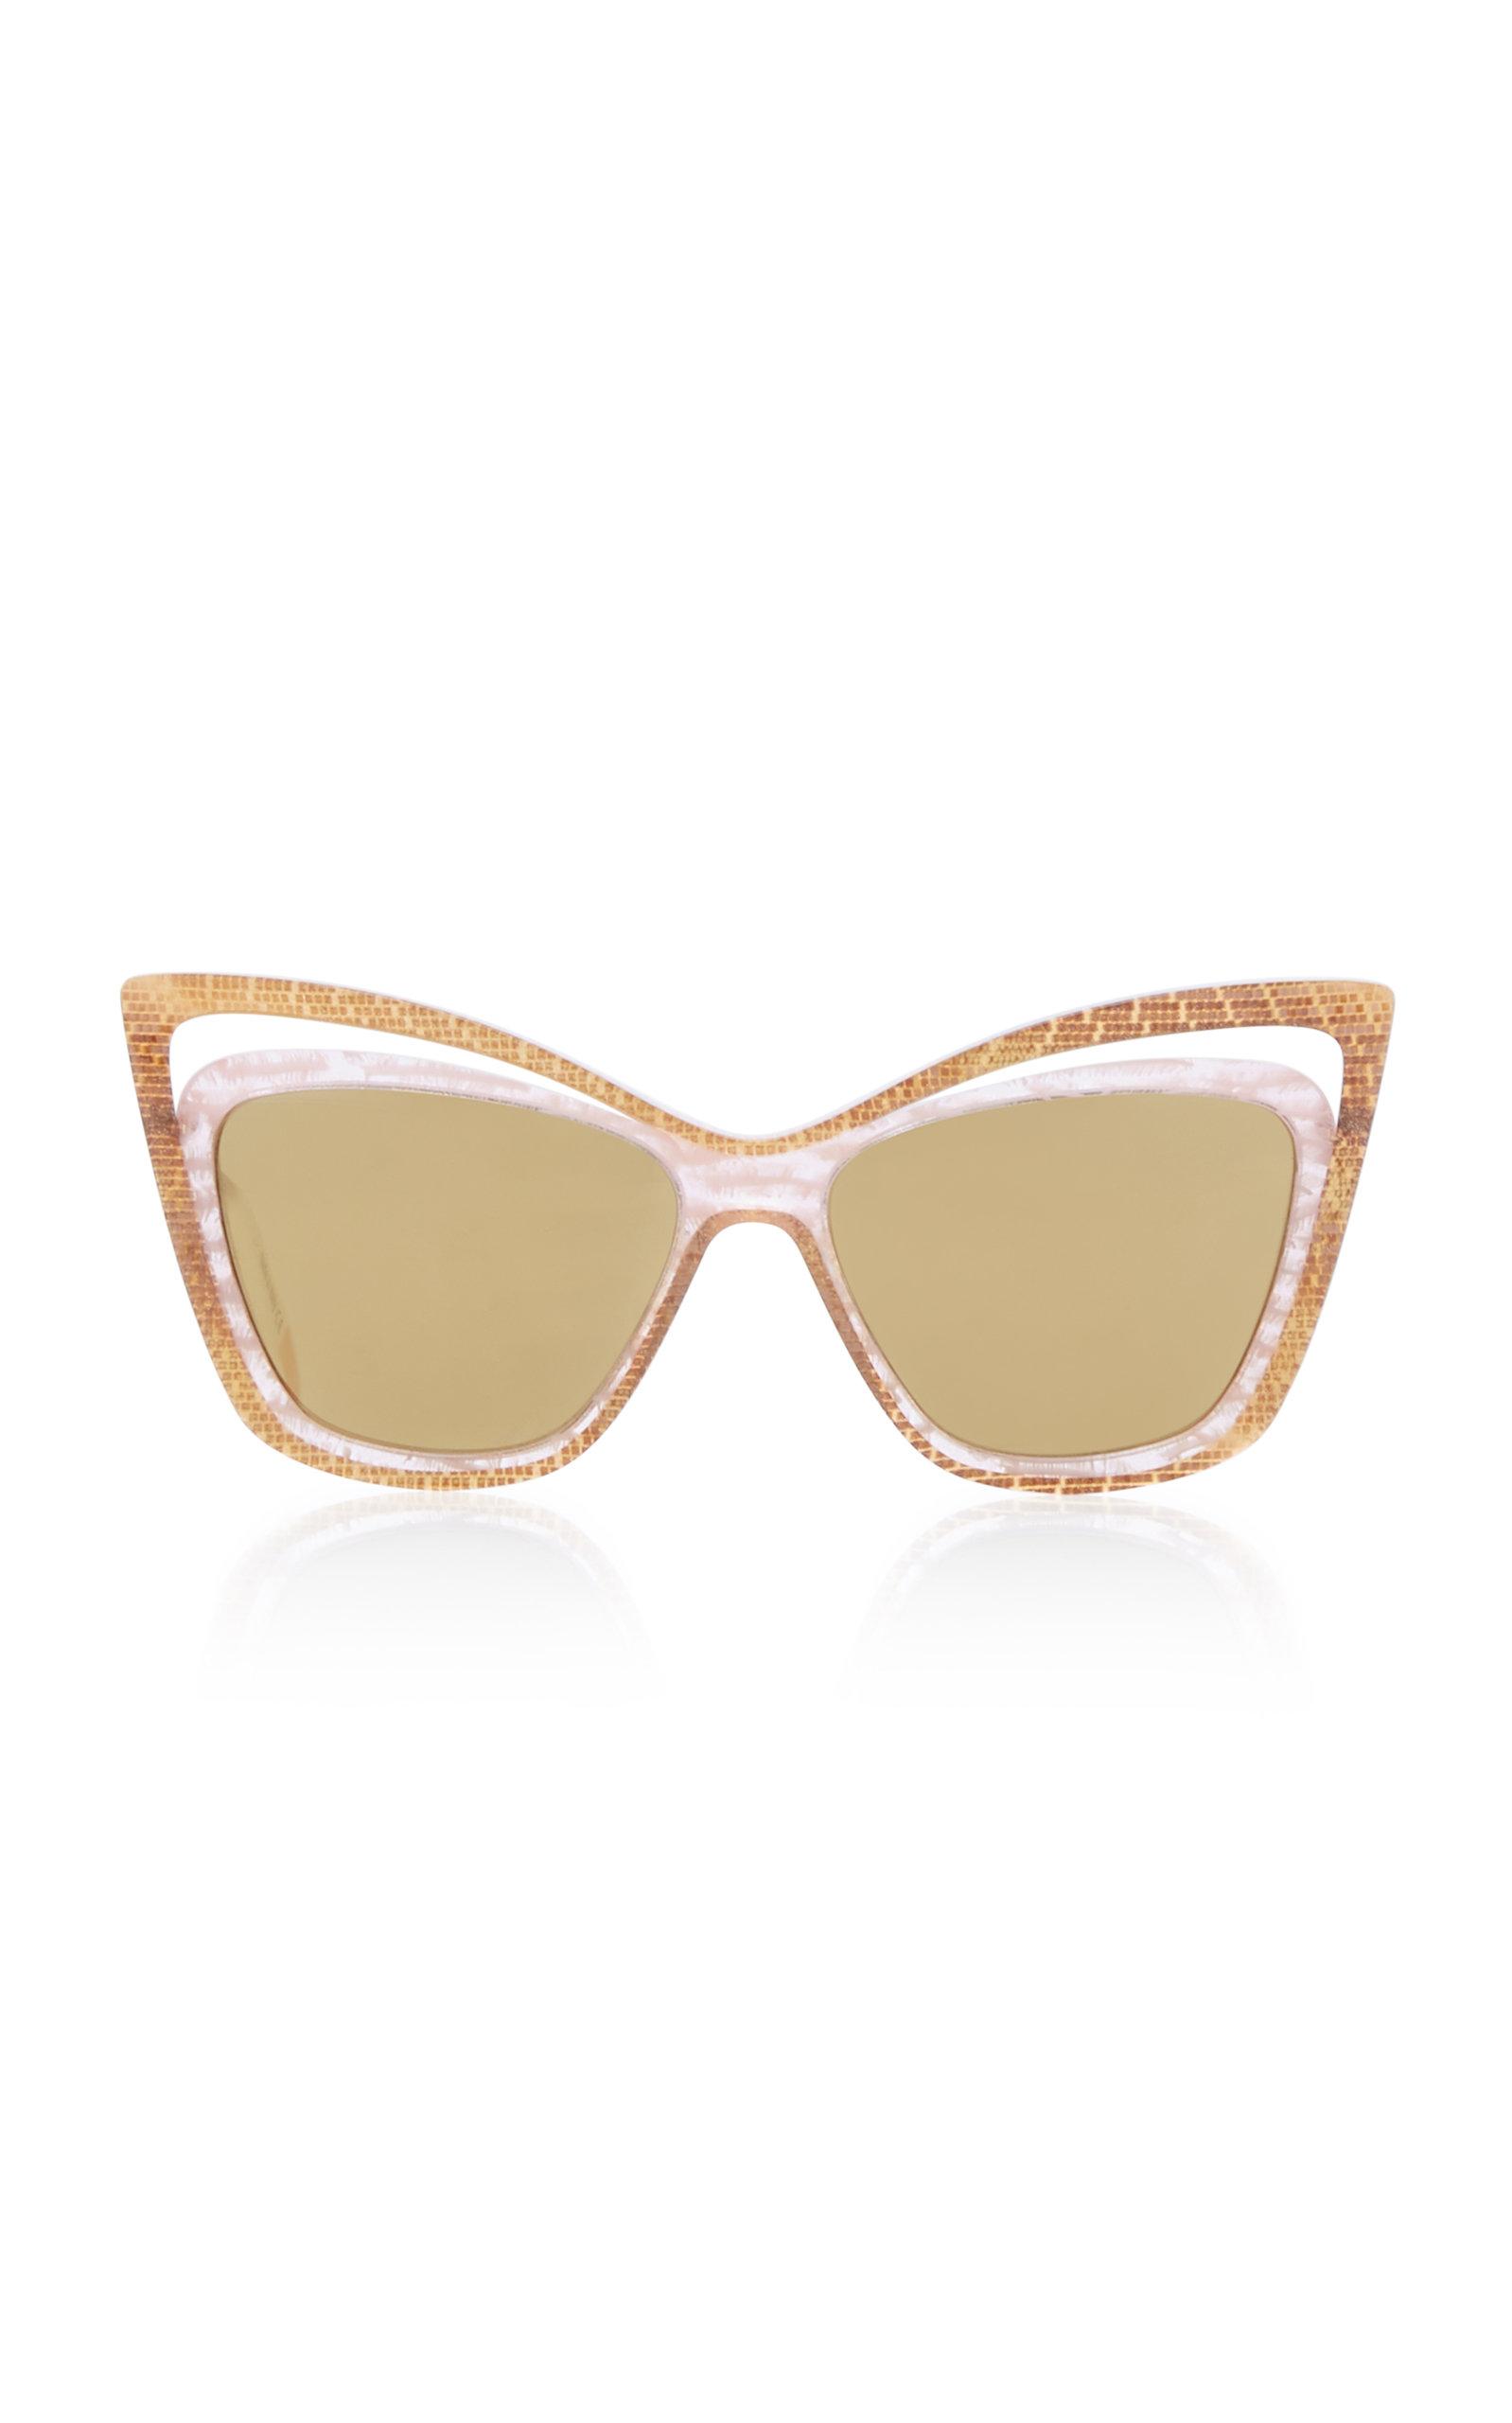 484631d6b Rock 'N Roth Cat-Eye Sunglasses | For her | Cat eye sunglasses ...